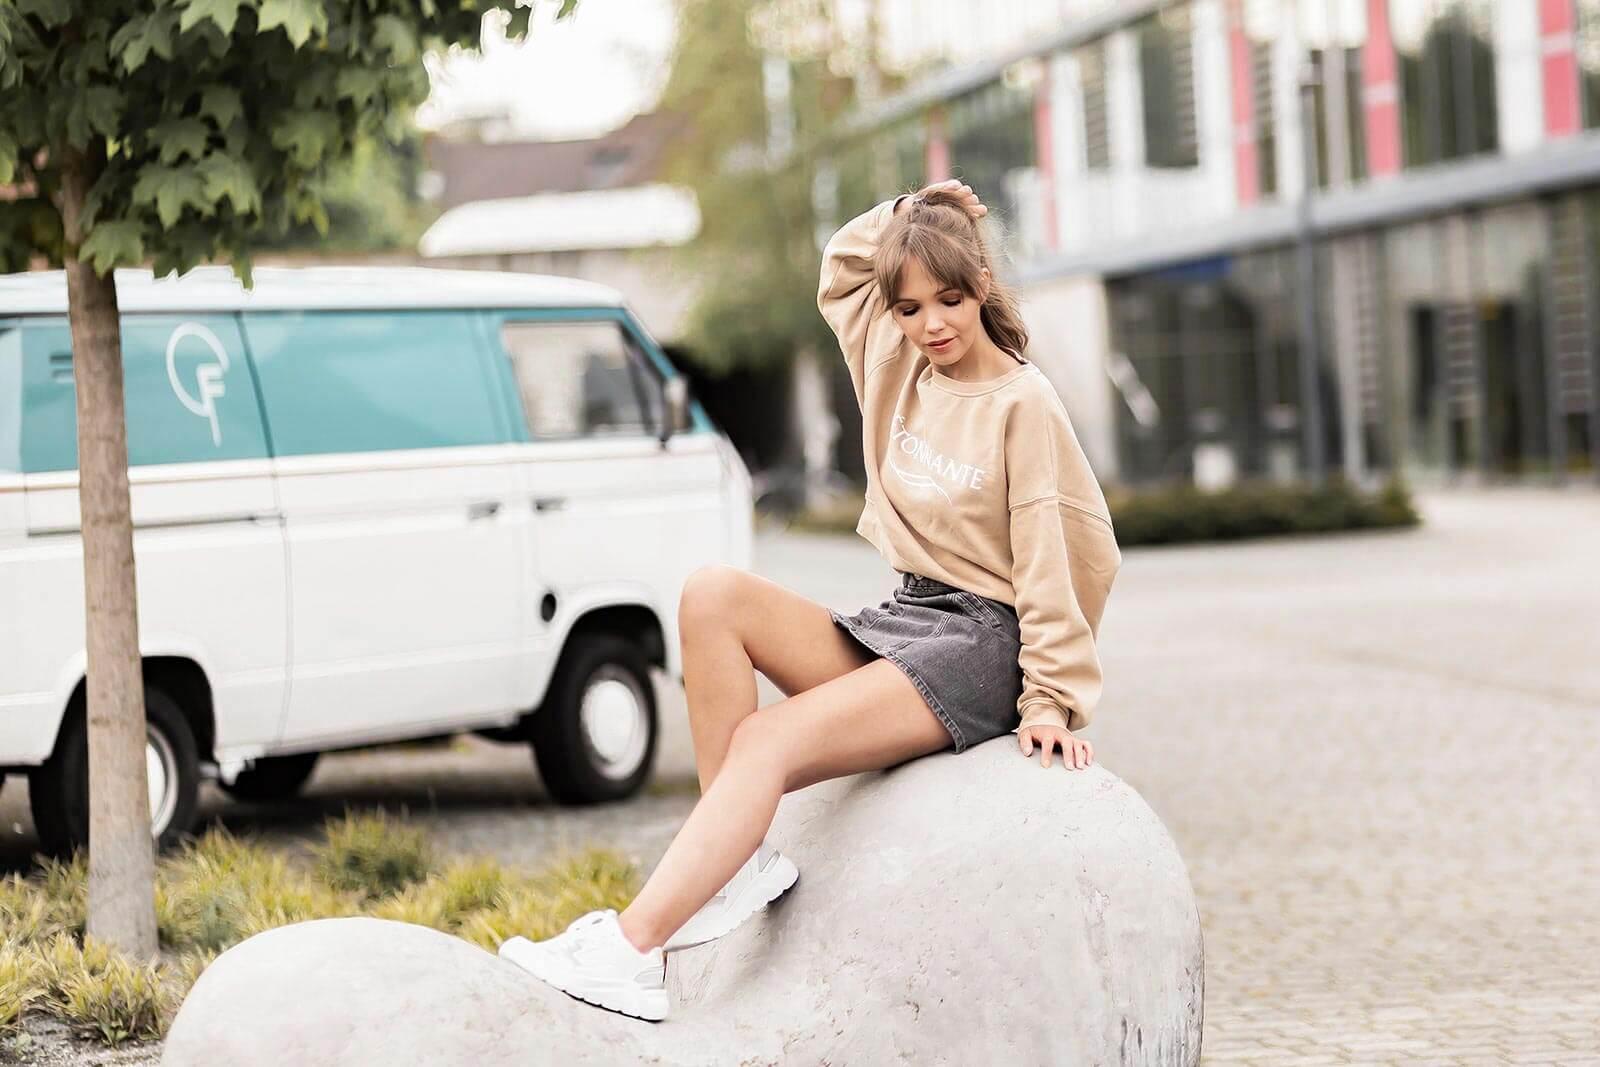 Sweater im Frühling stylen, Sweater Trends 2020, Styling Tipps für Sweater, Cropped Sweater, Shoelove by Deichmann